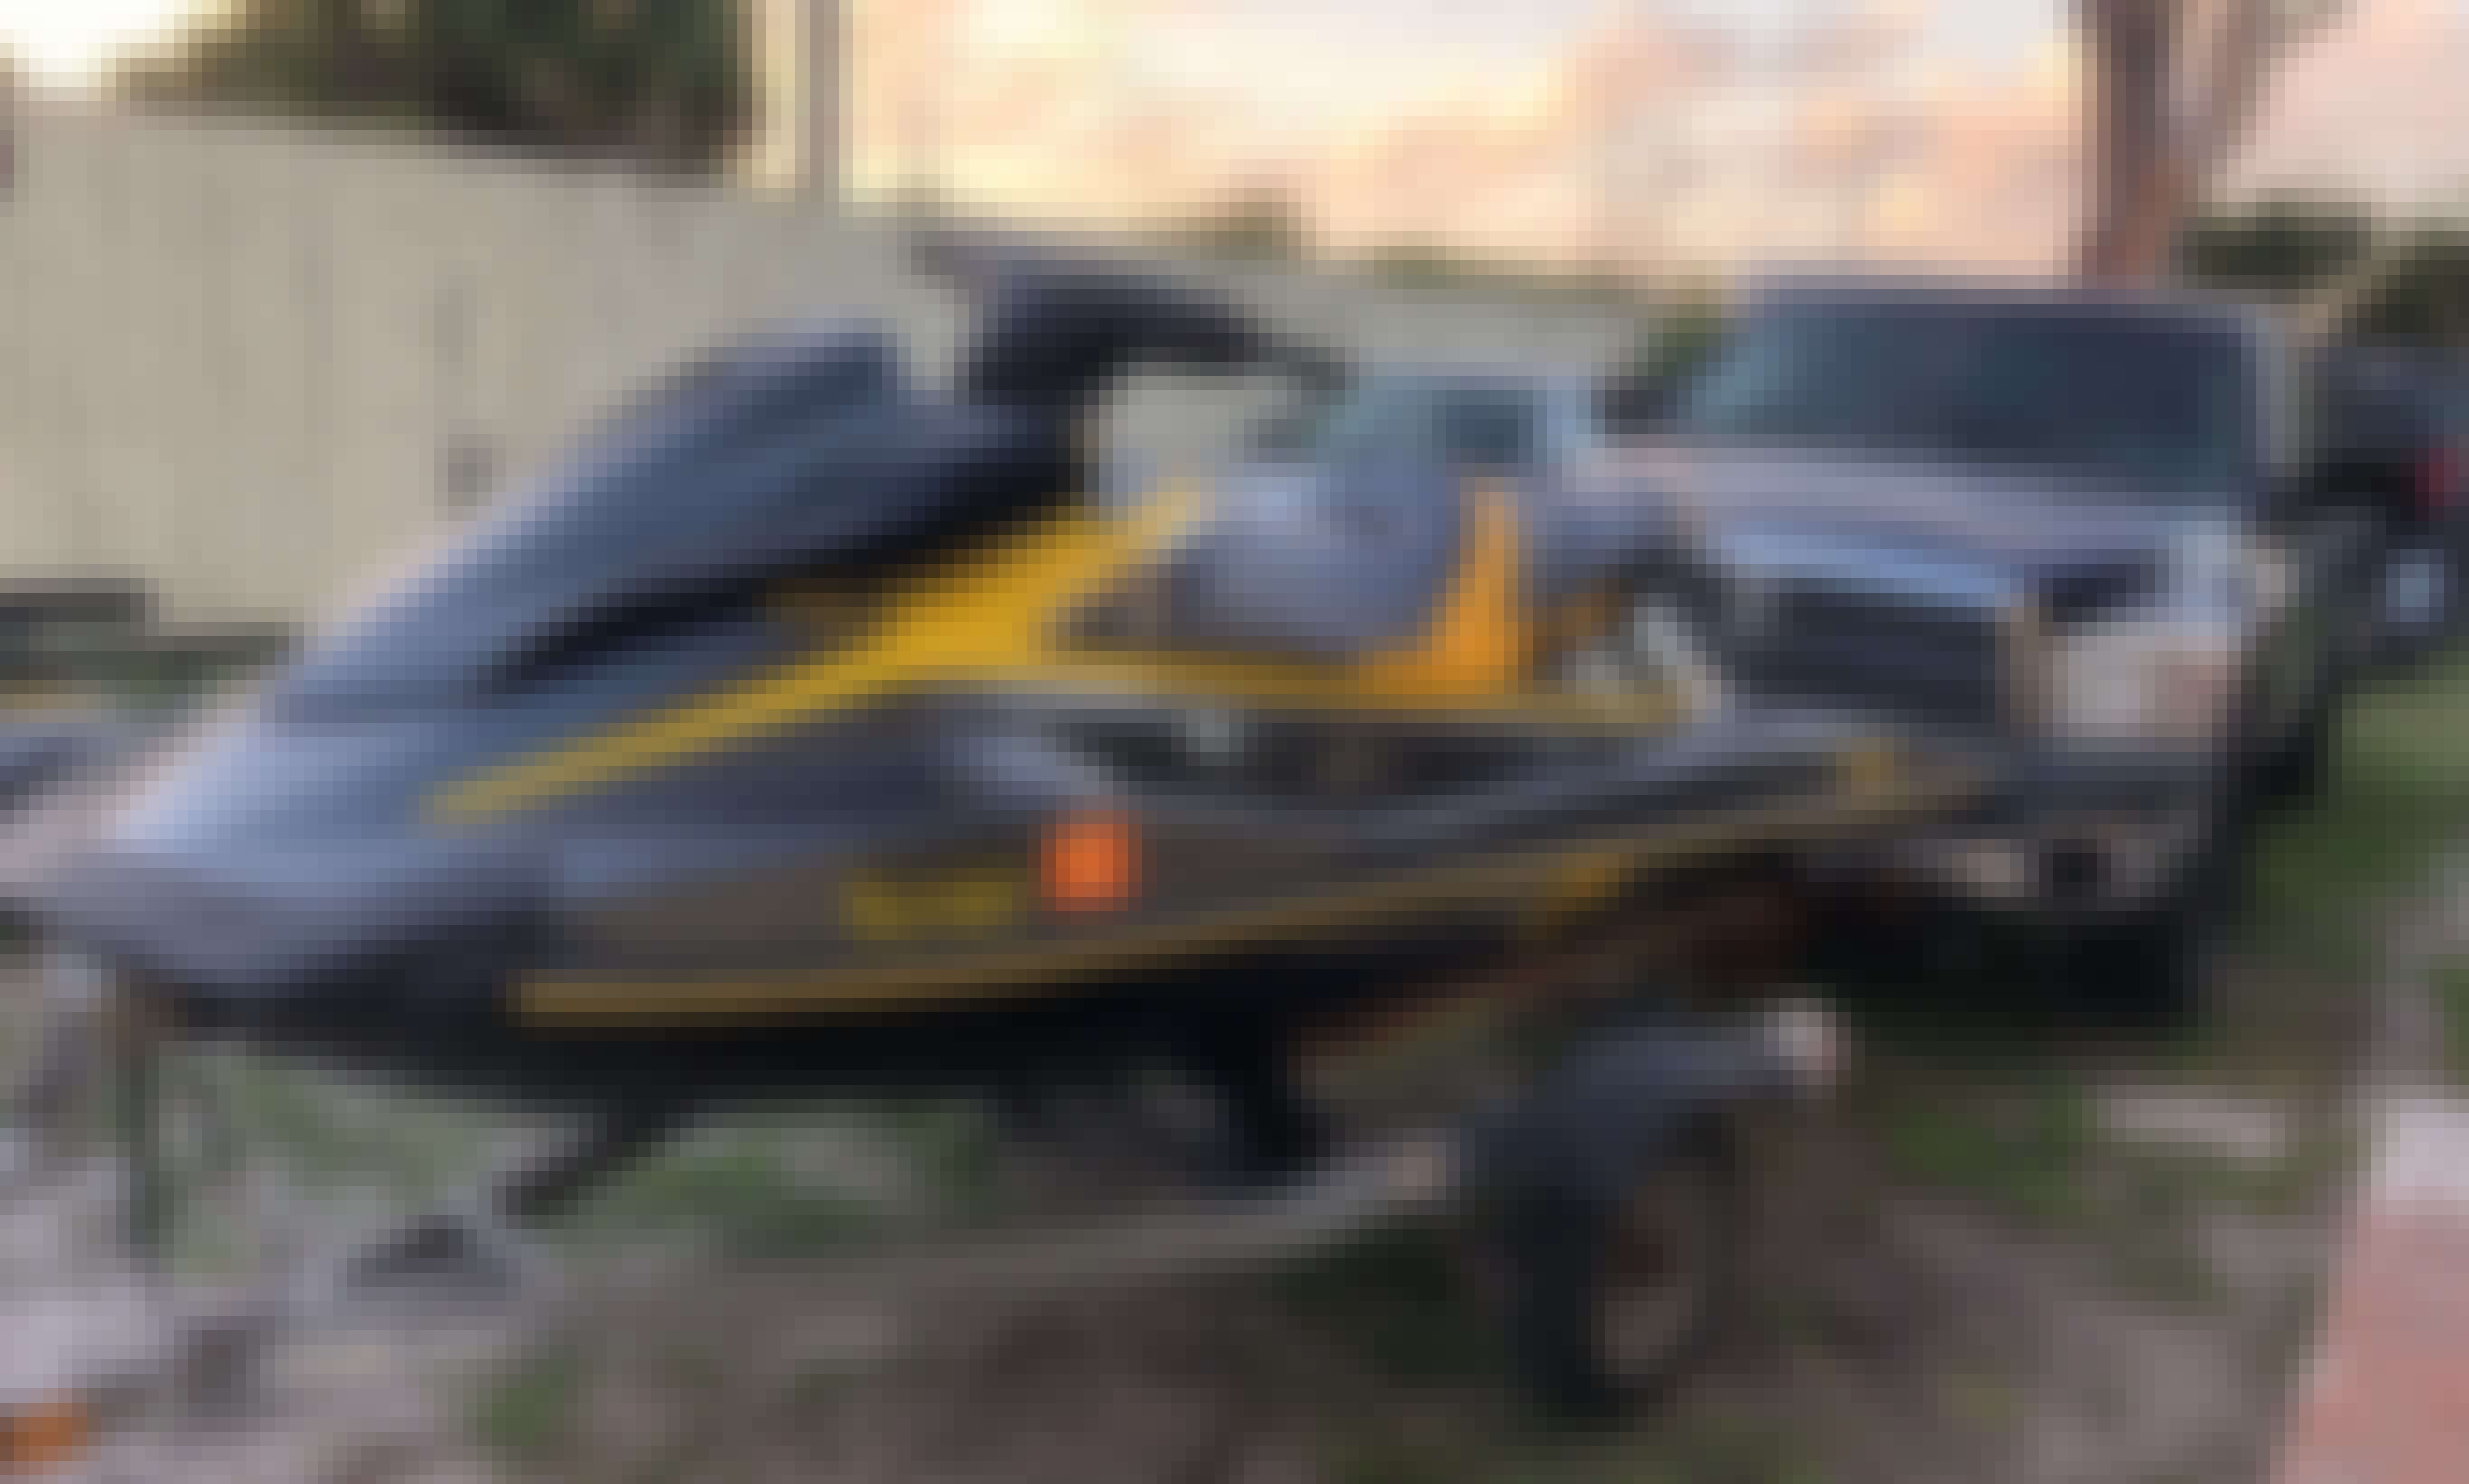 Rent a Yamaha Jet Ski in Miami Beach, Florida